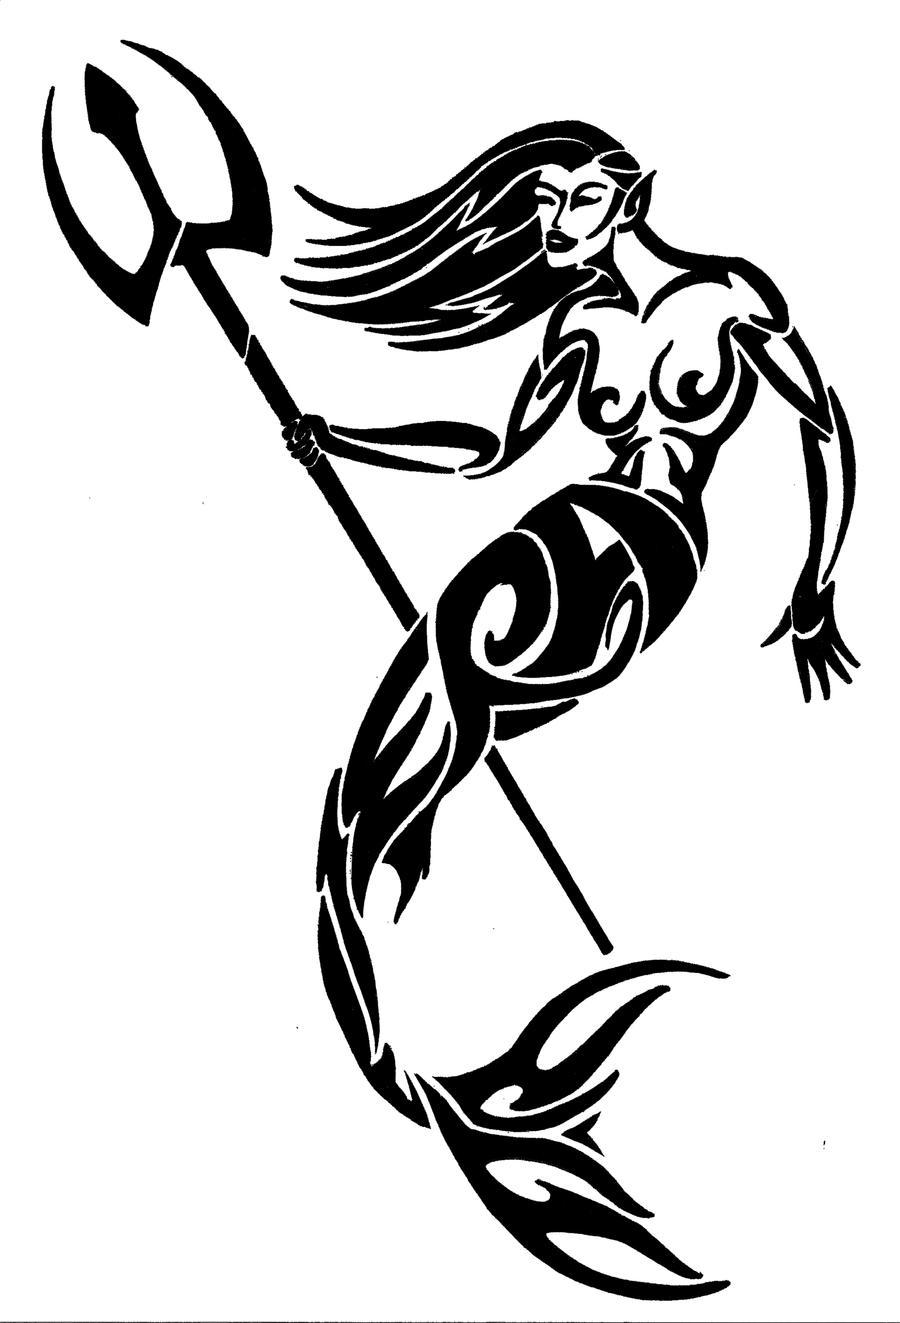 Tribal Mermaid design by WEDMER on DeviantArt